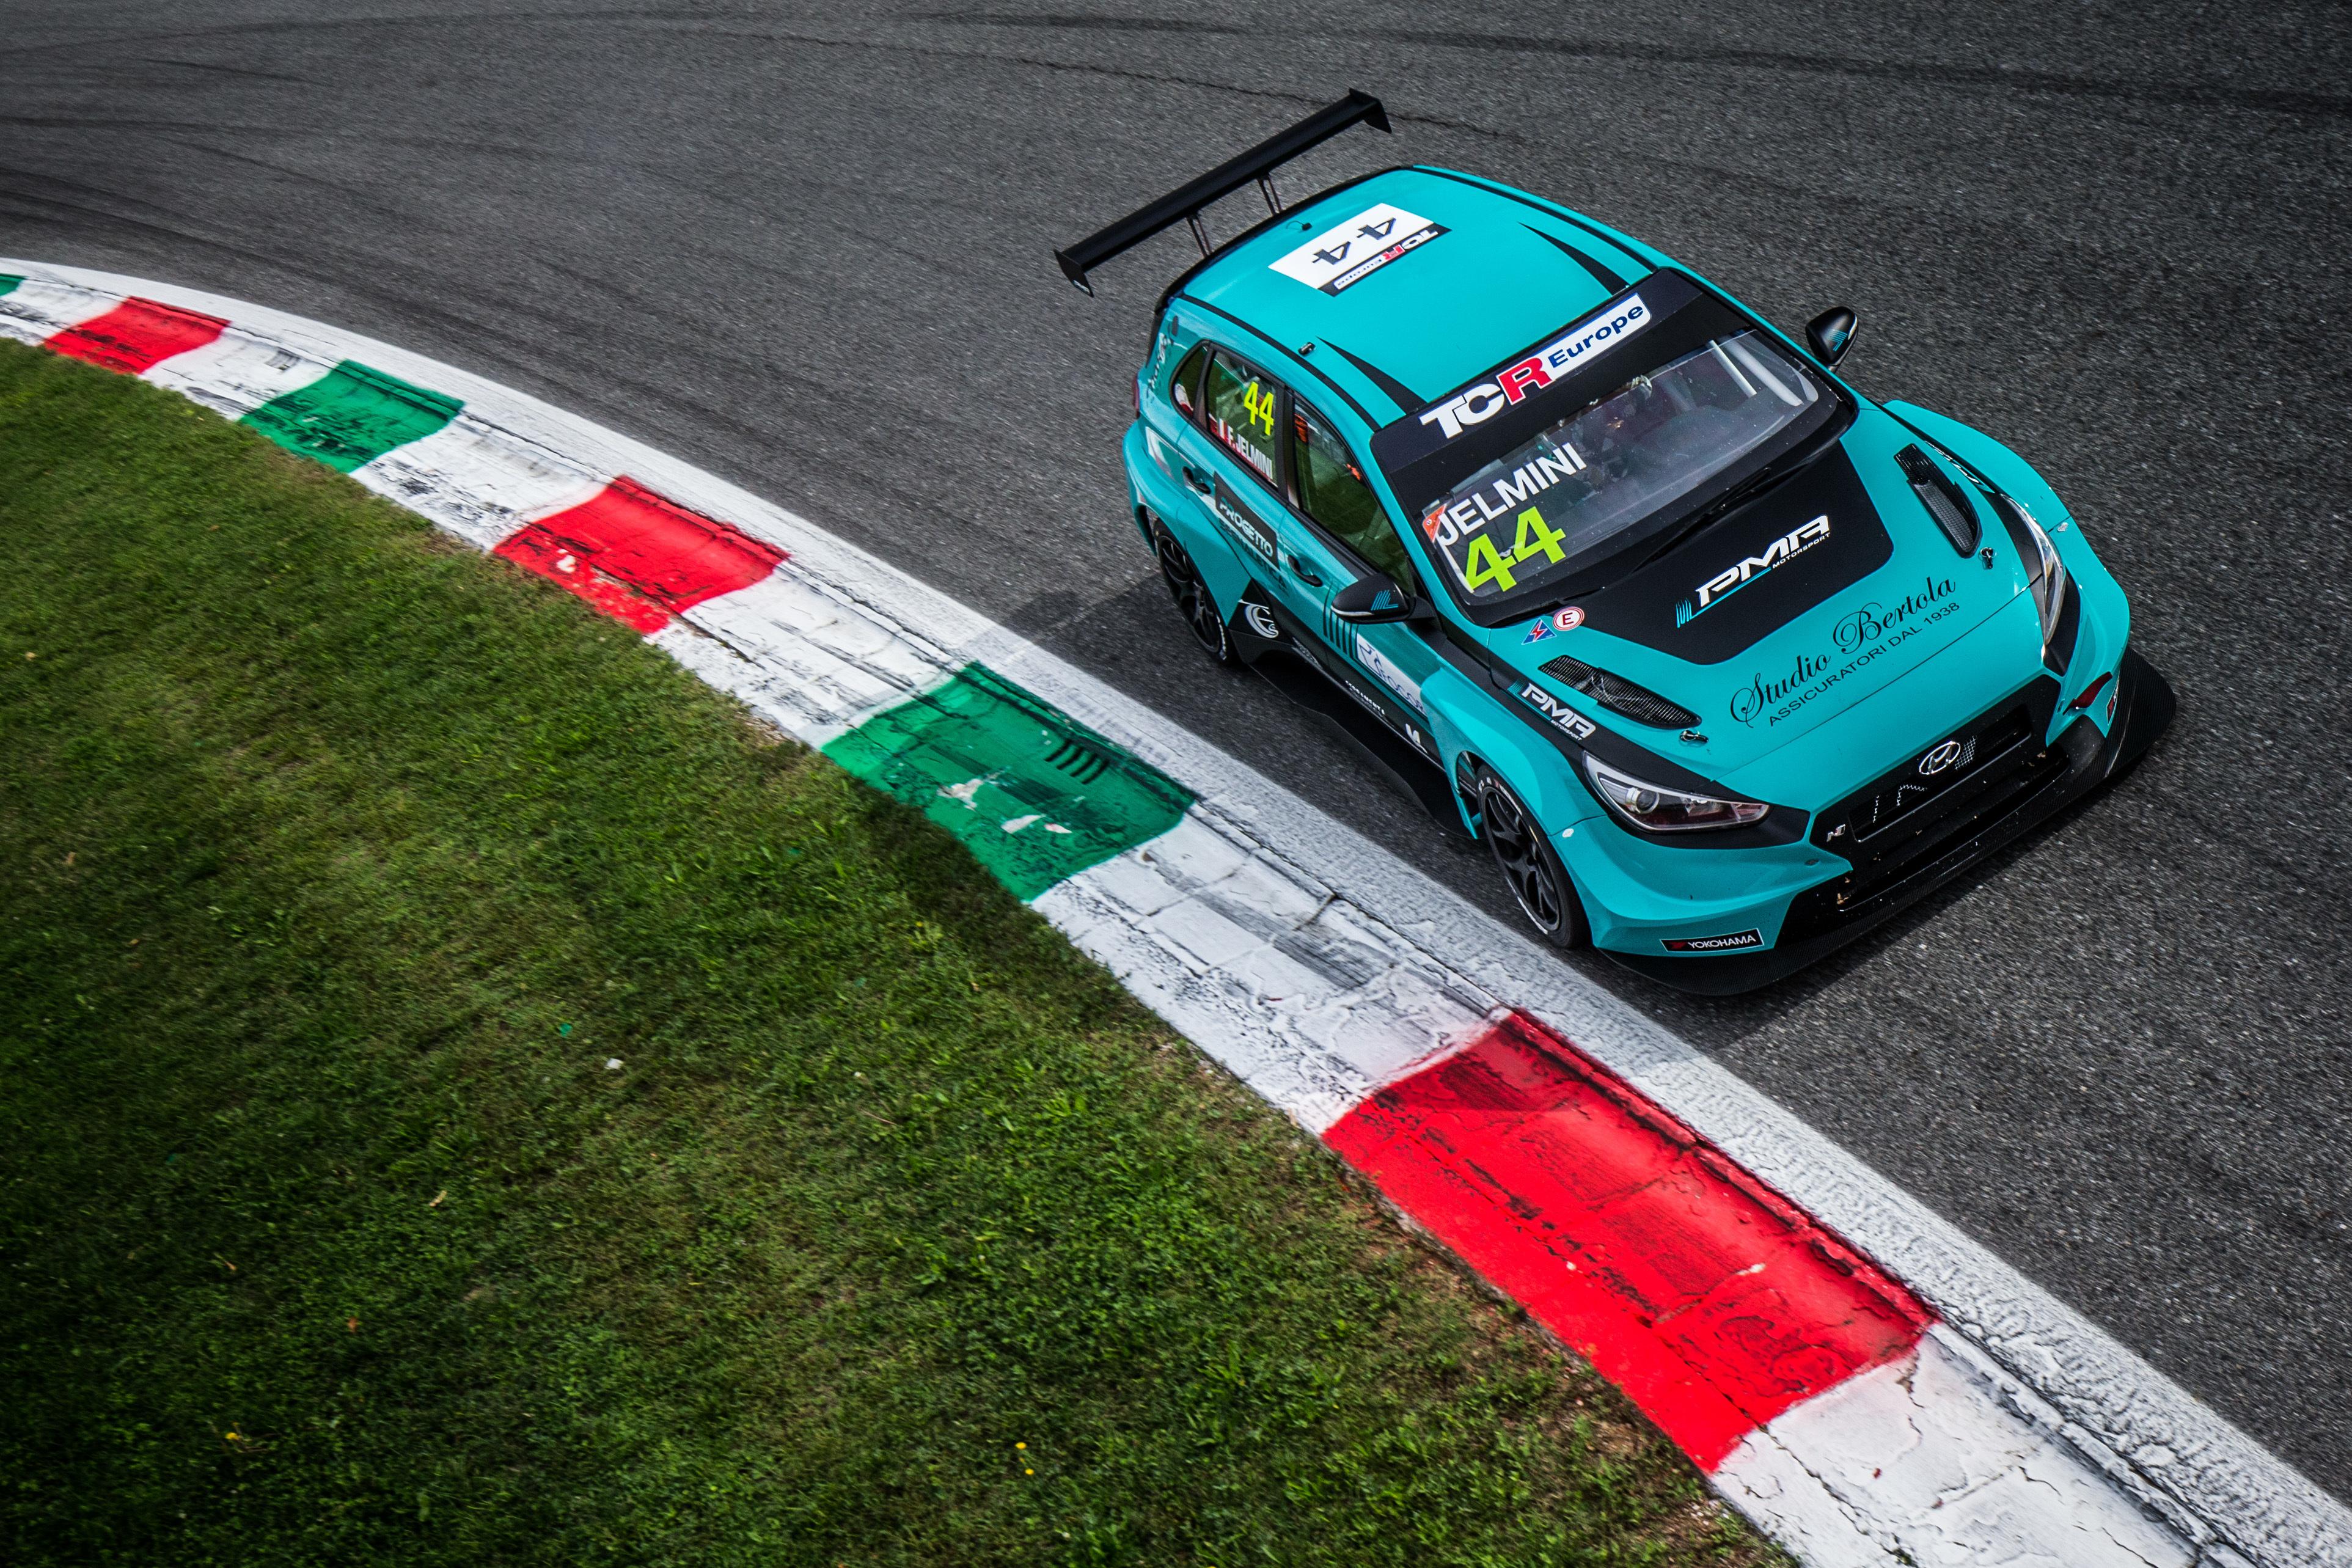 Felice Jelmini - Monza